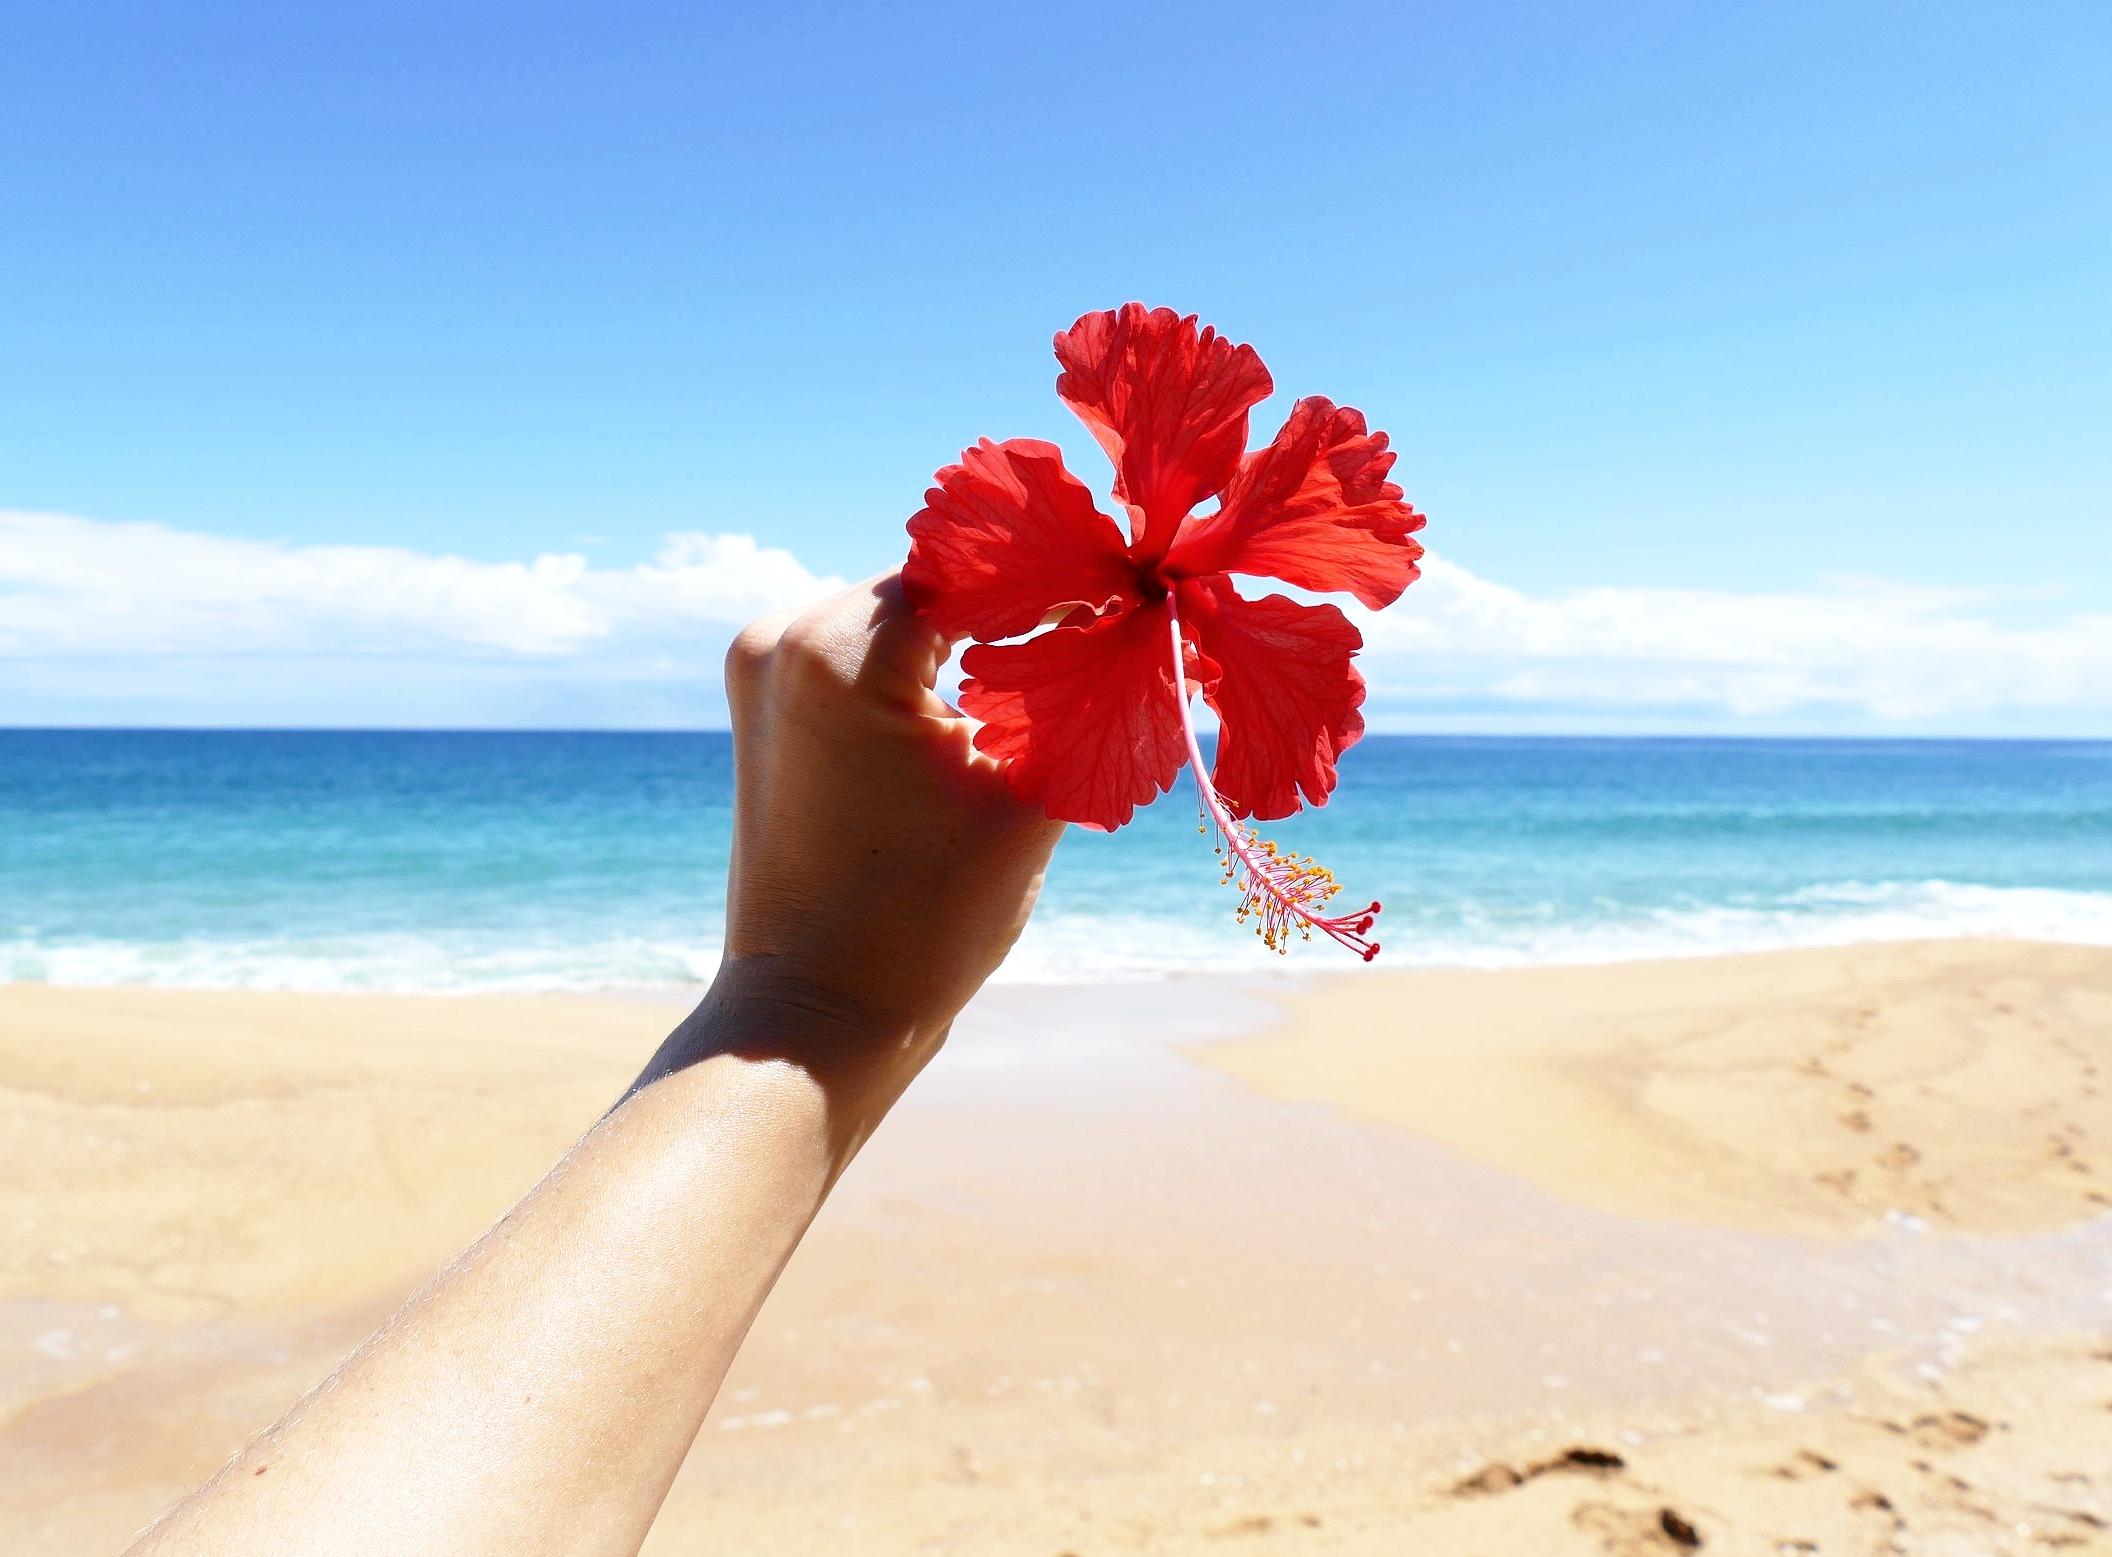 Hibiscus Love - Playa Bluff, Bocas del Toro